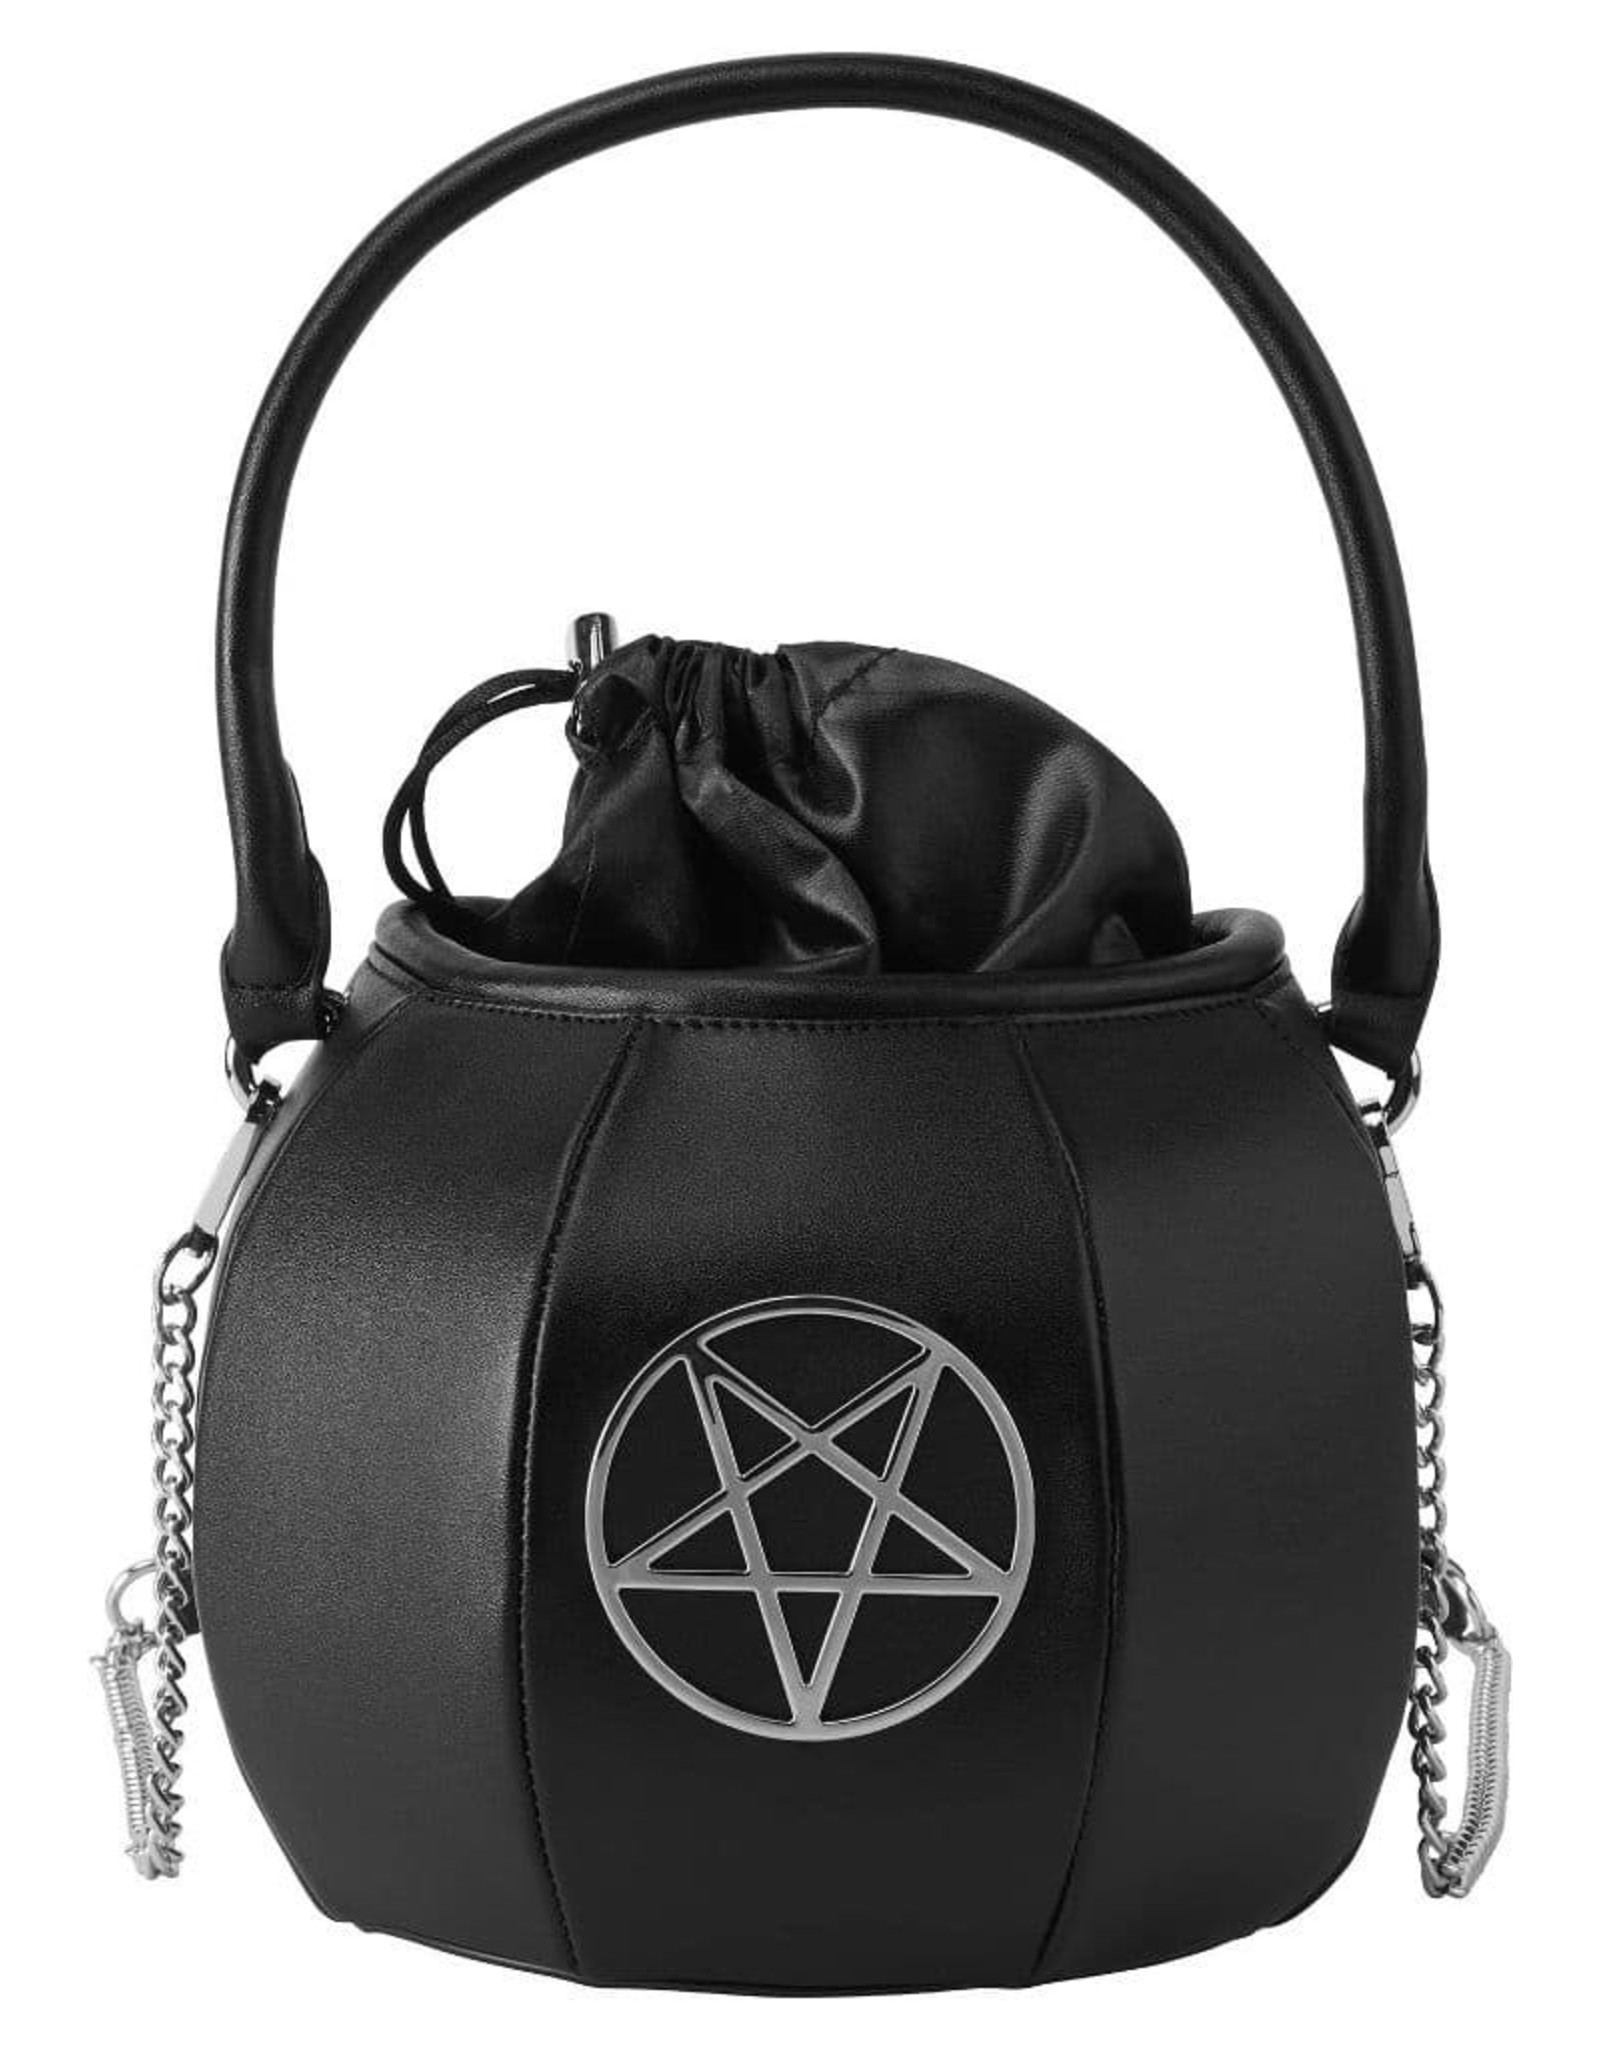 Killstar Gothic tassen Steampunk tassen -  Killstar heksen ketel handtas Cauldron